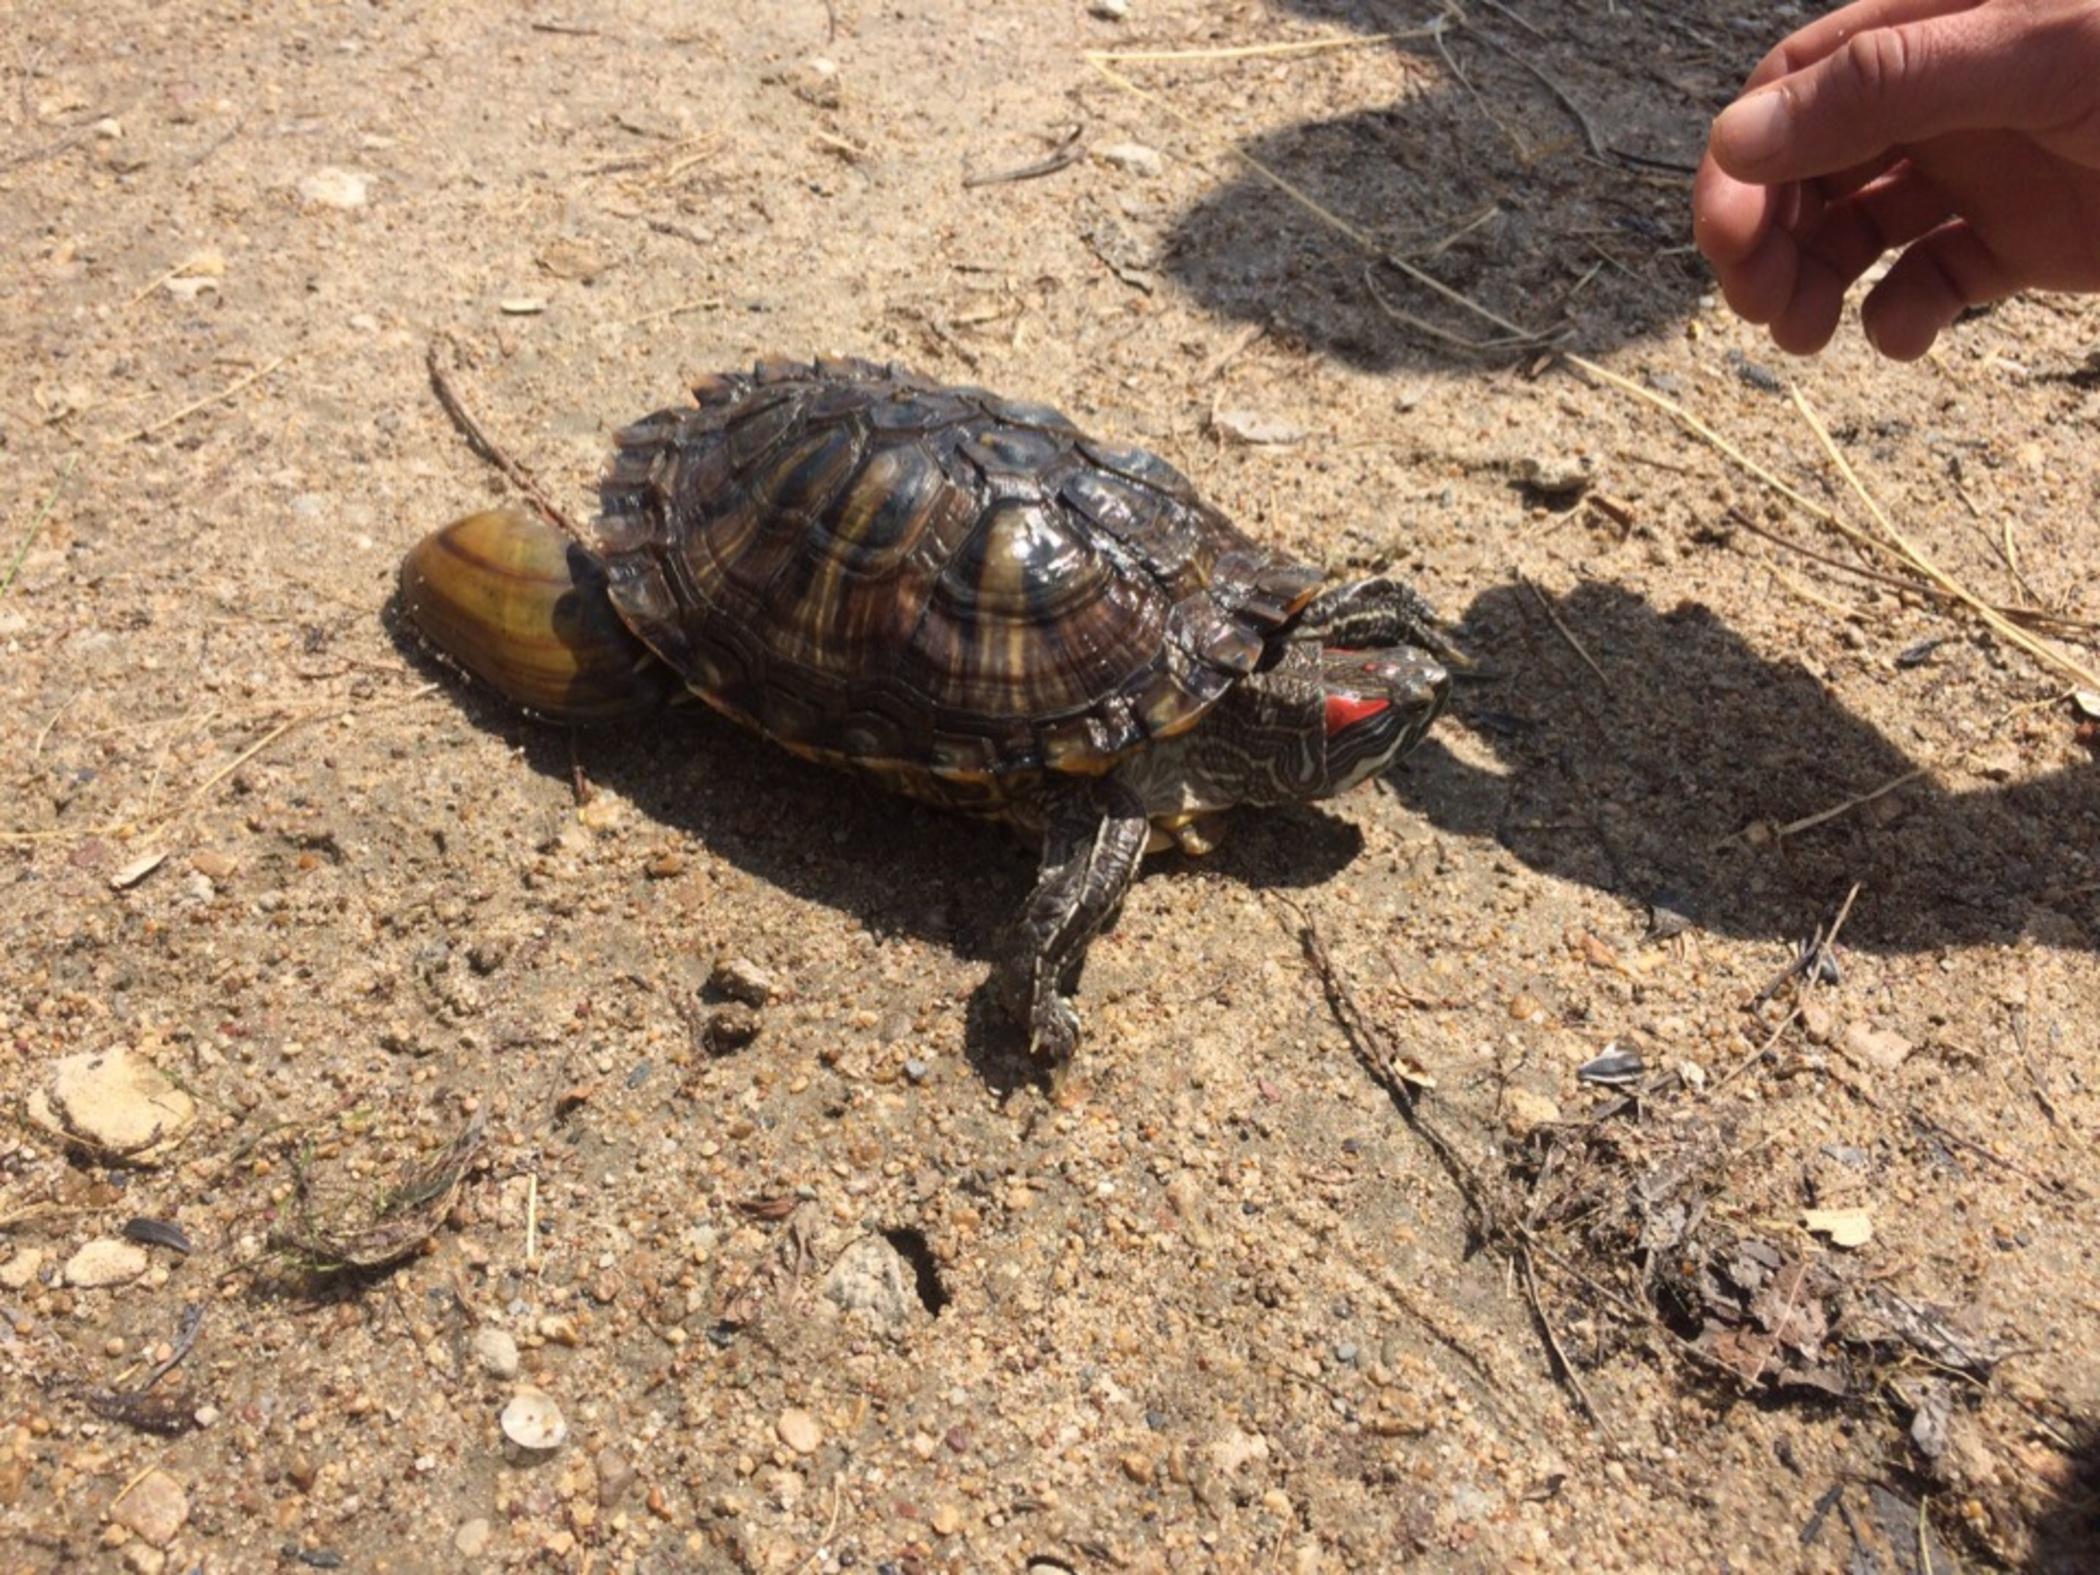 В Иртыше поймали экзотическую черепаху. 15946.jpeg